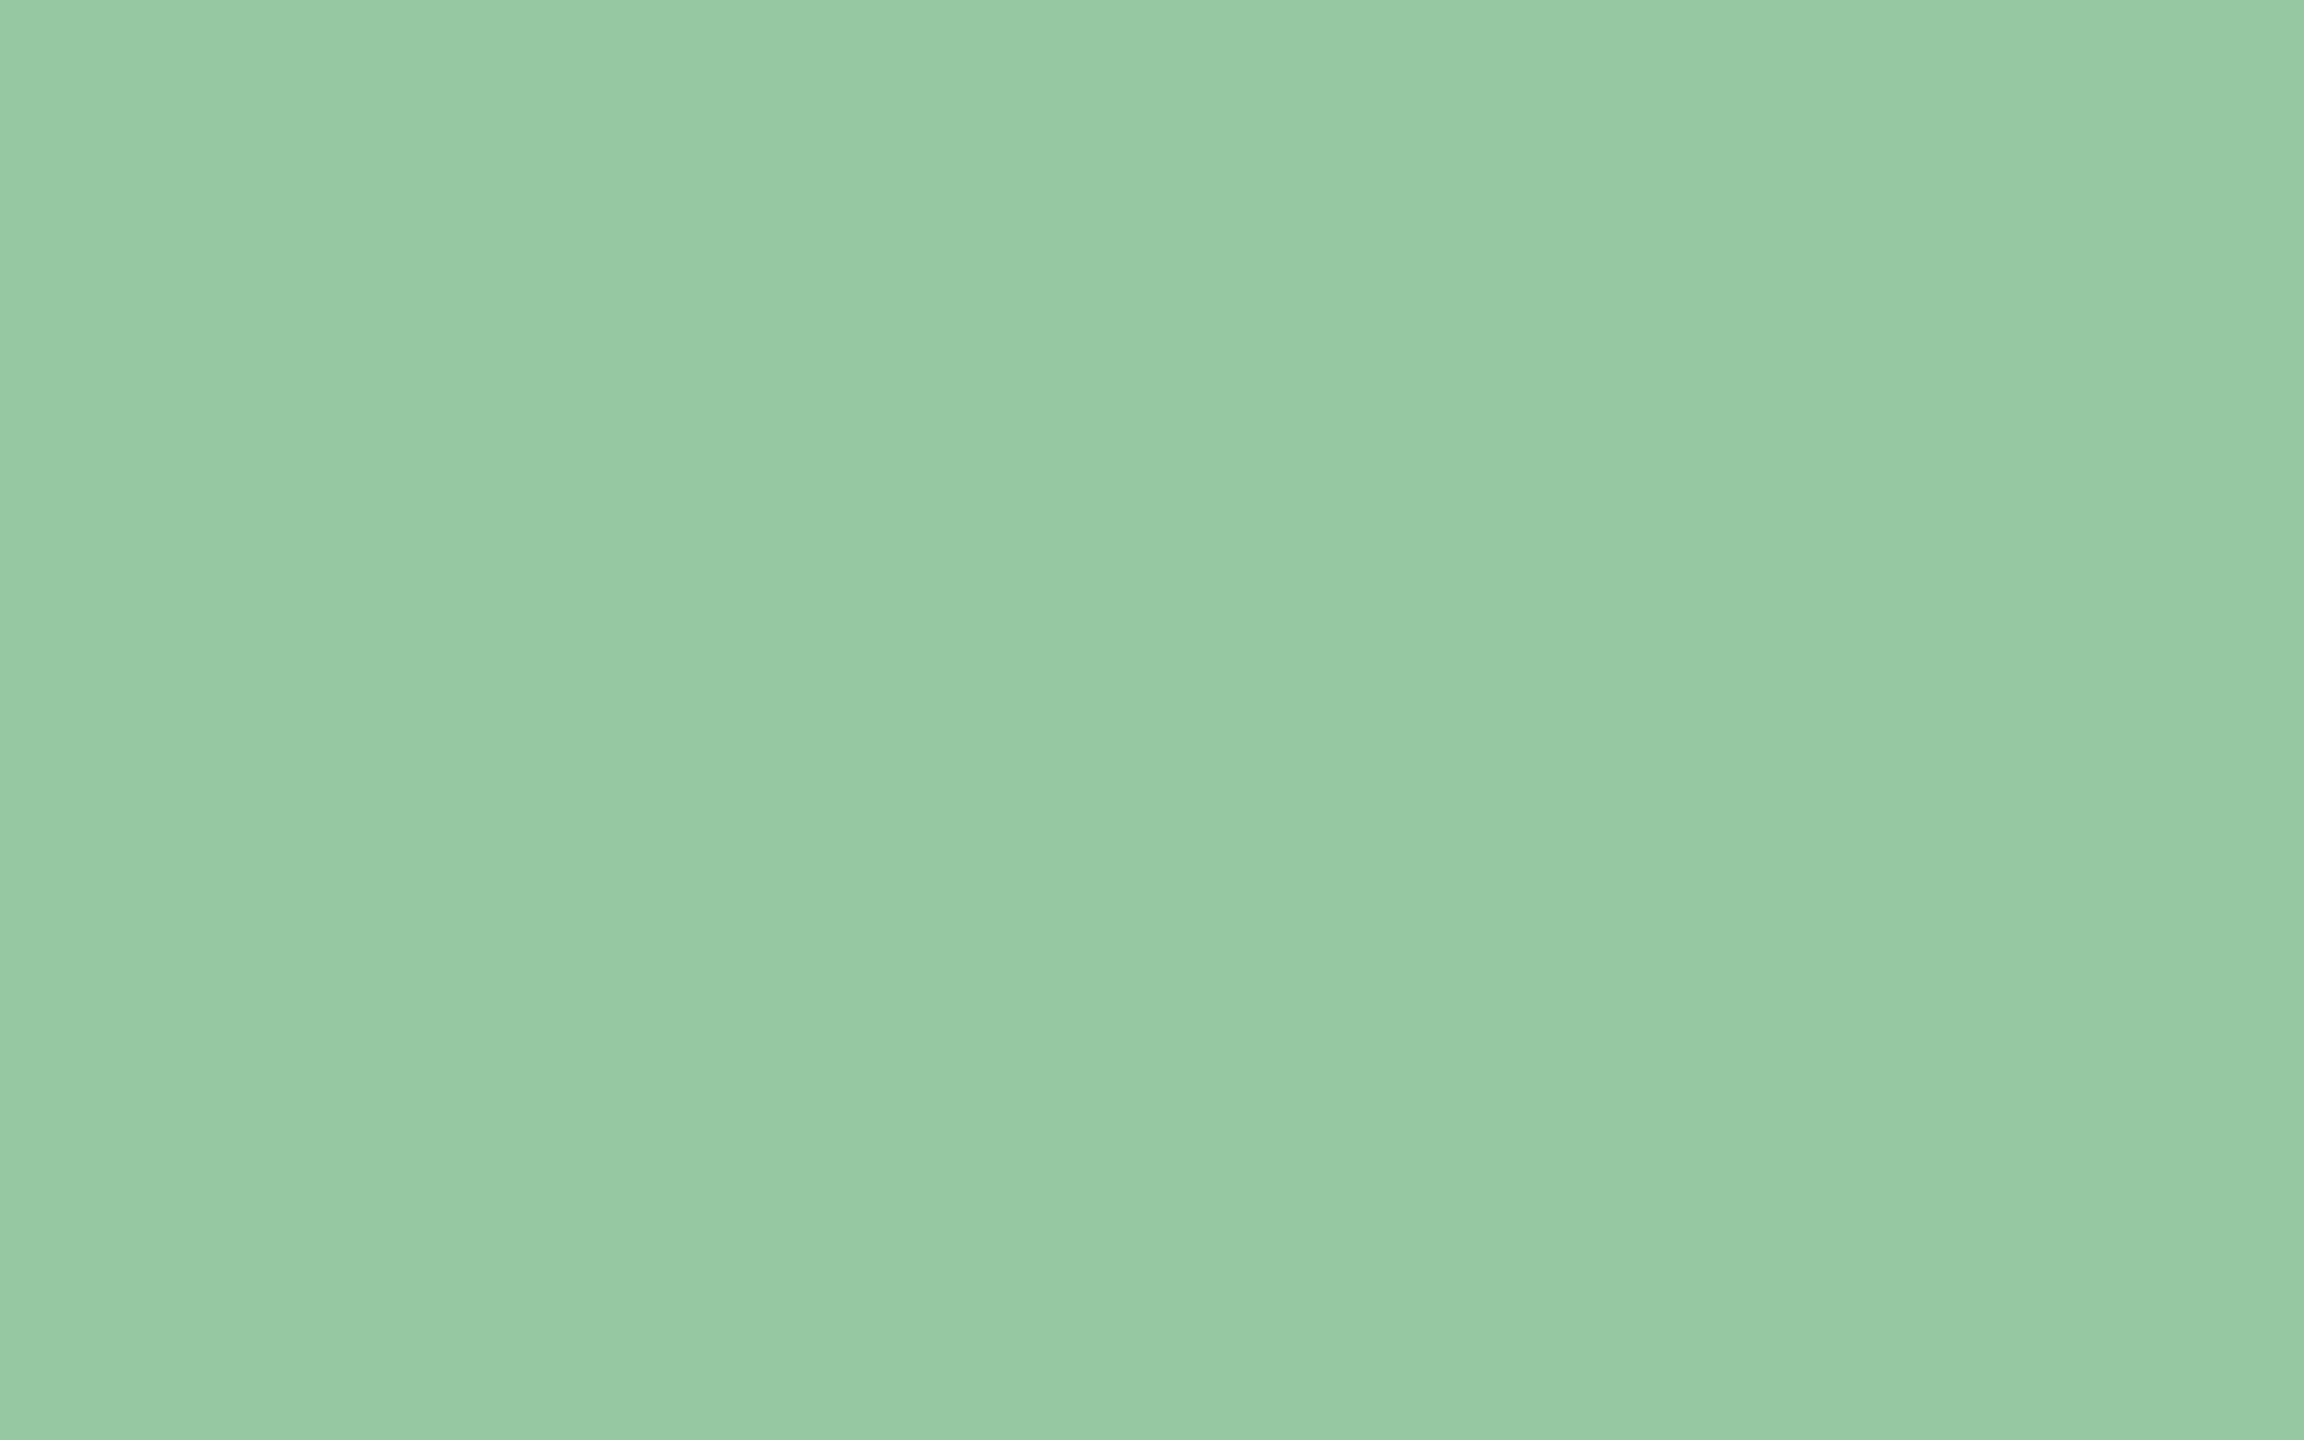 2304x1440 Eton Blue Solid Color Background